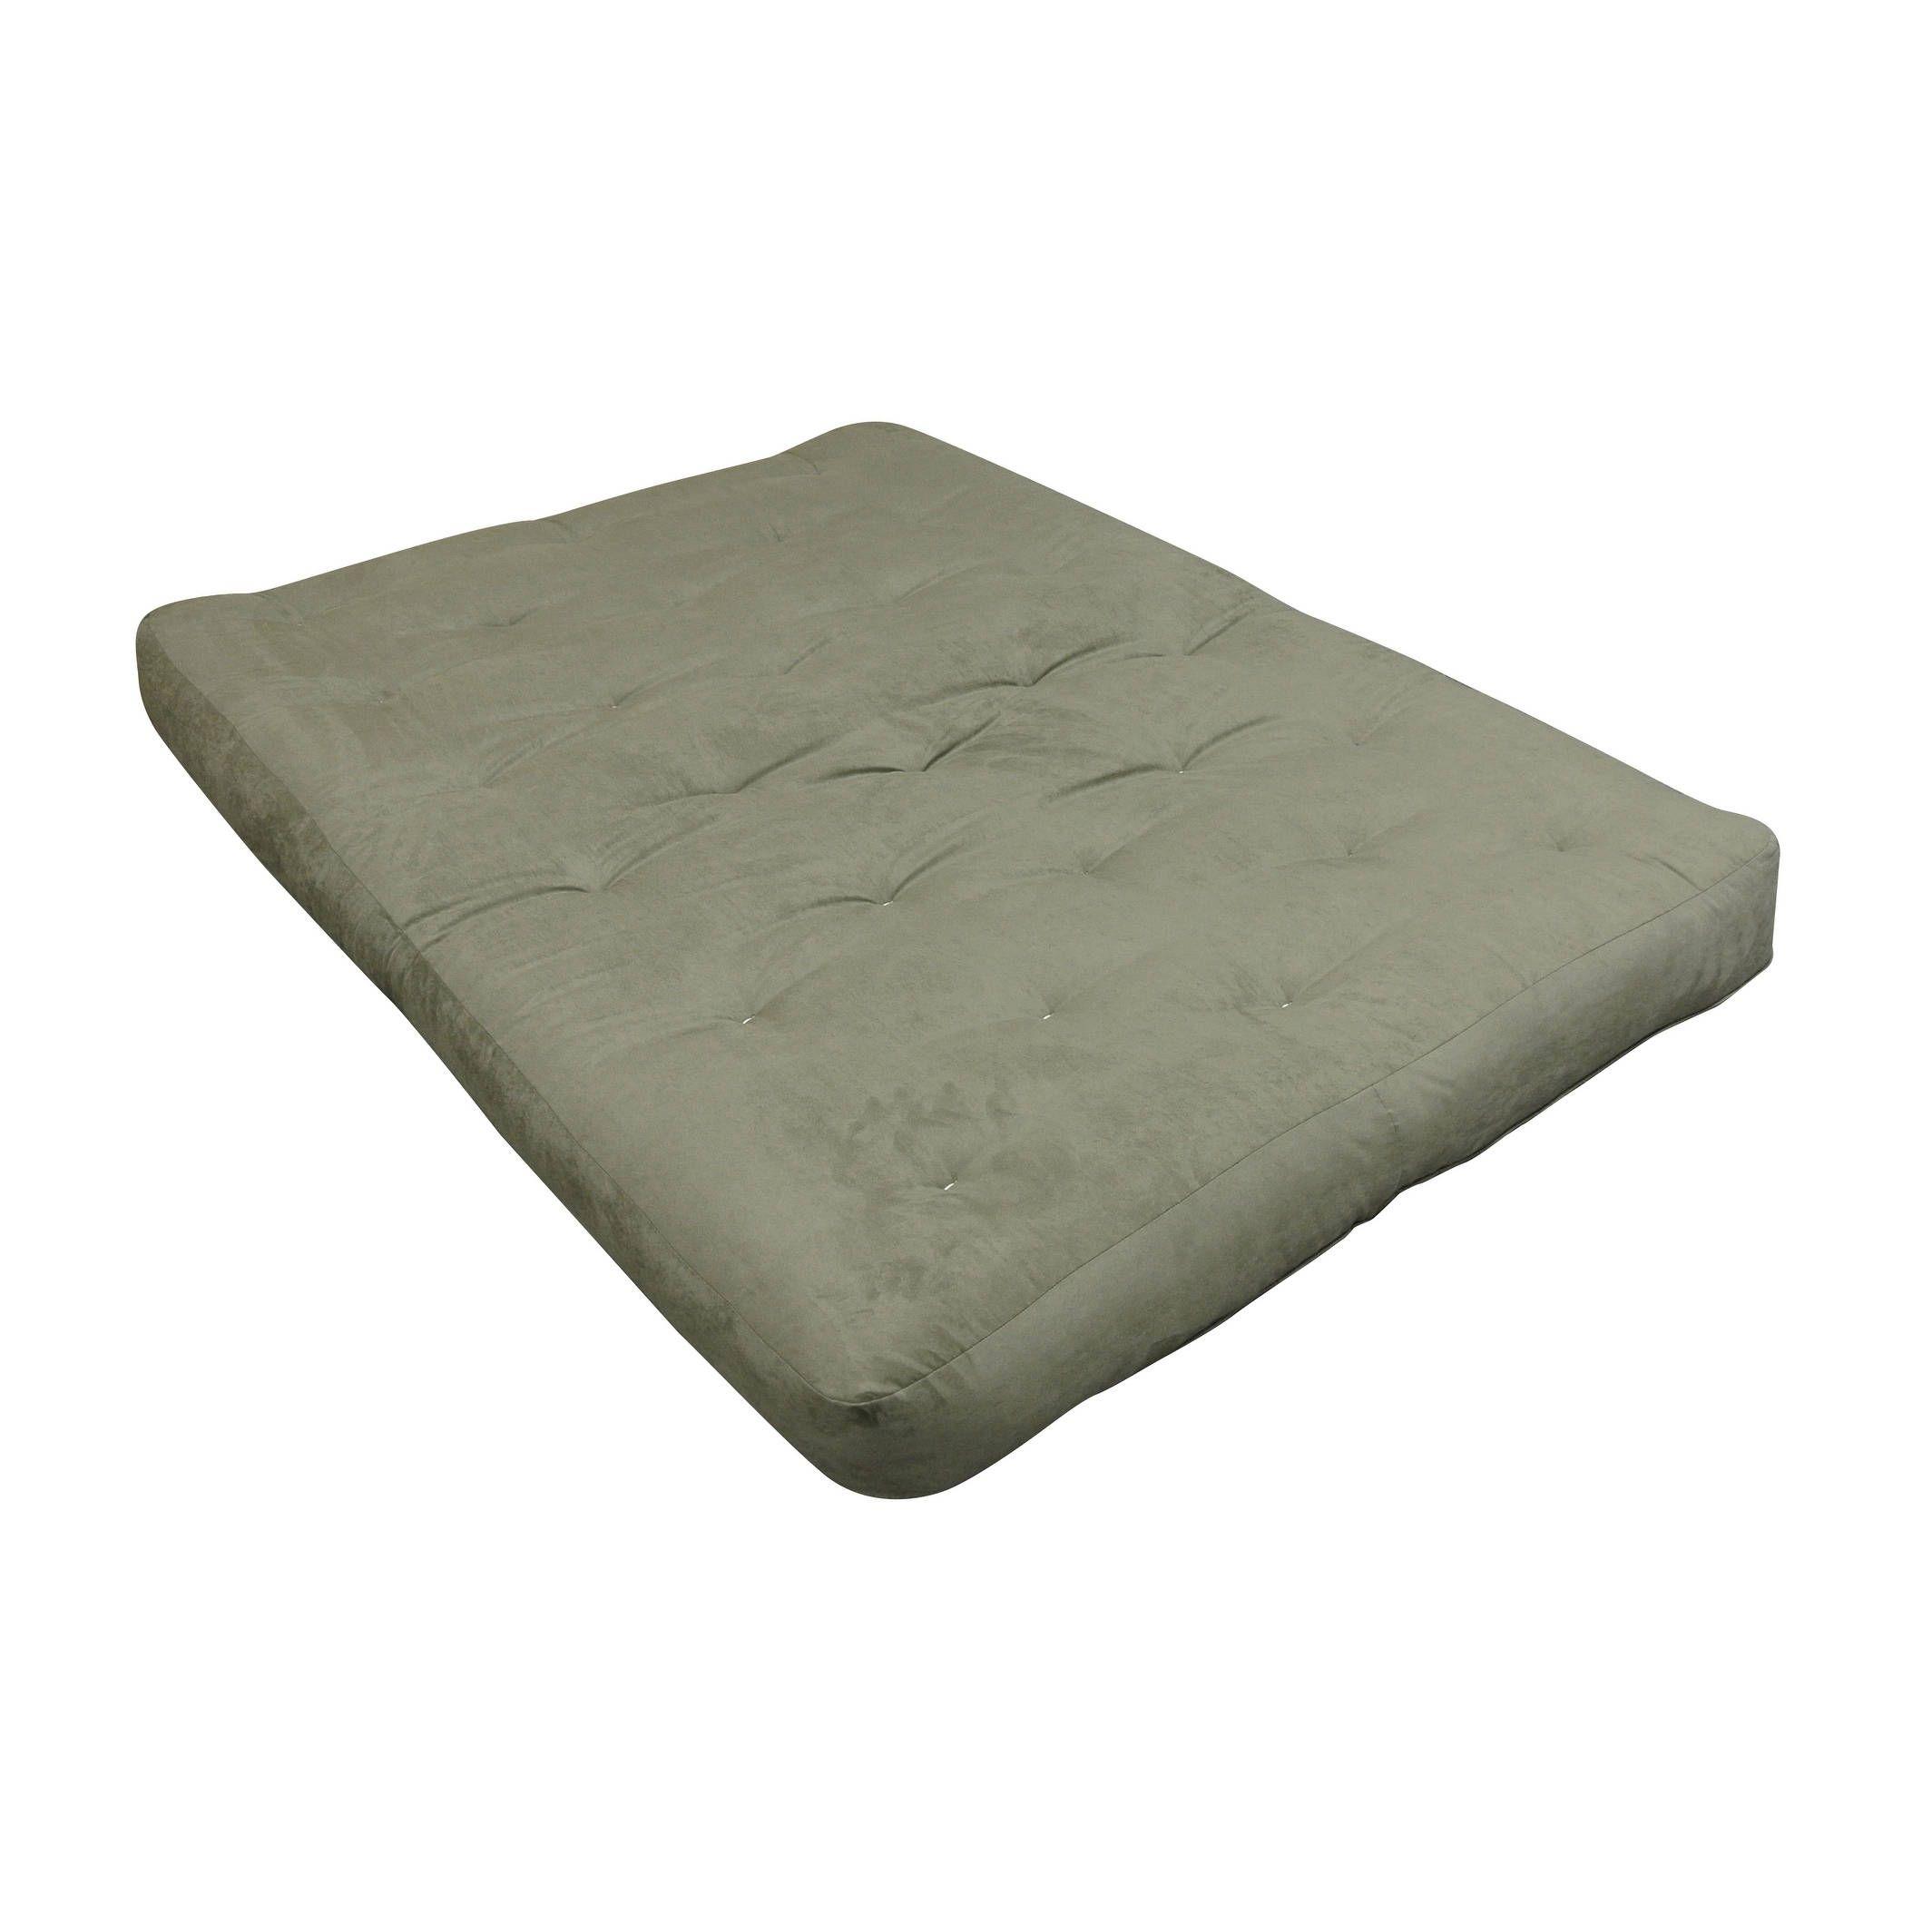 Comfortcoil Sage Microfiber 9 Inch Twin Size Futon Mattress Green Polyester Foam Cotton Innerspring